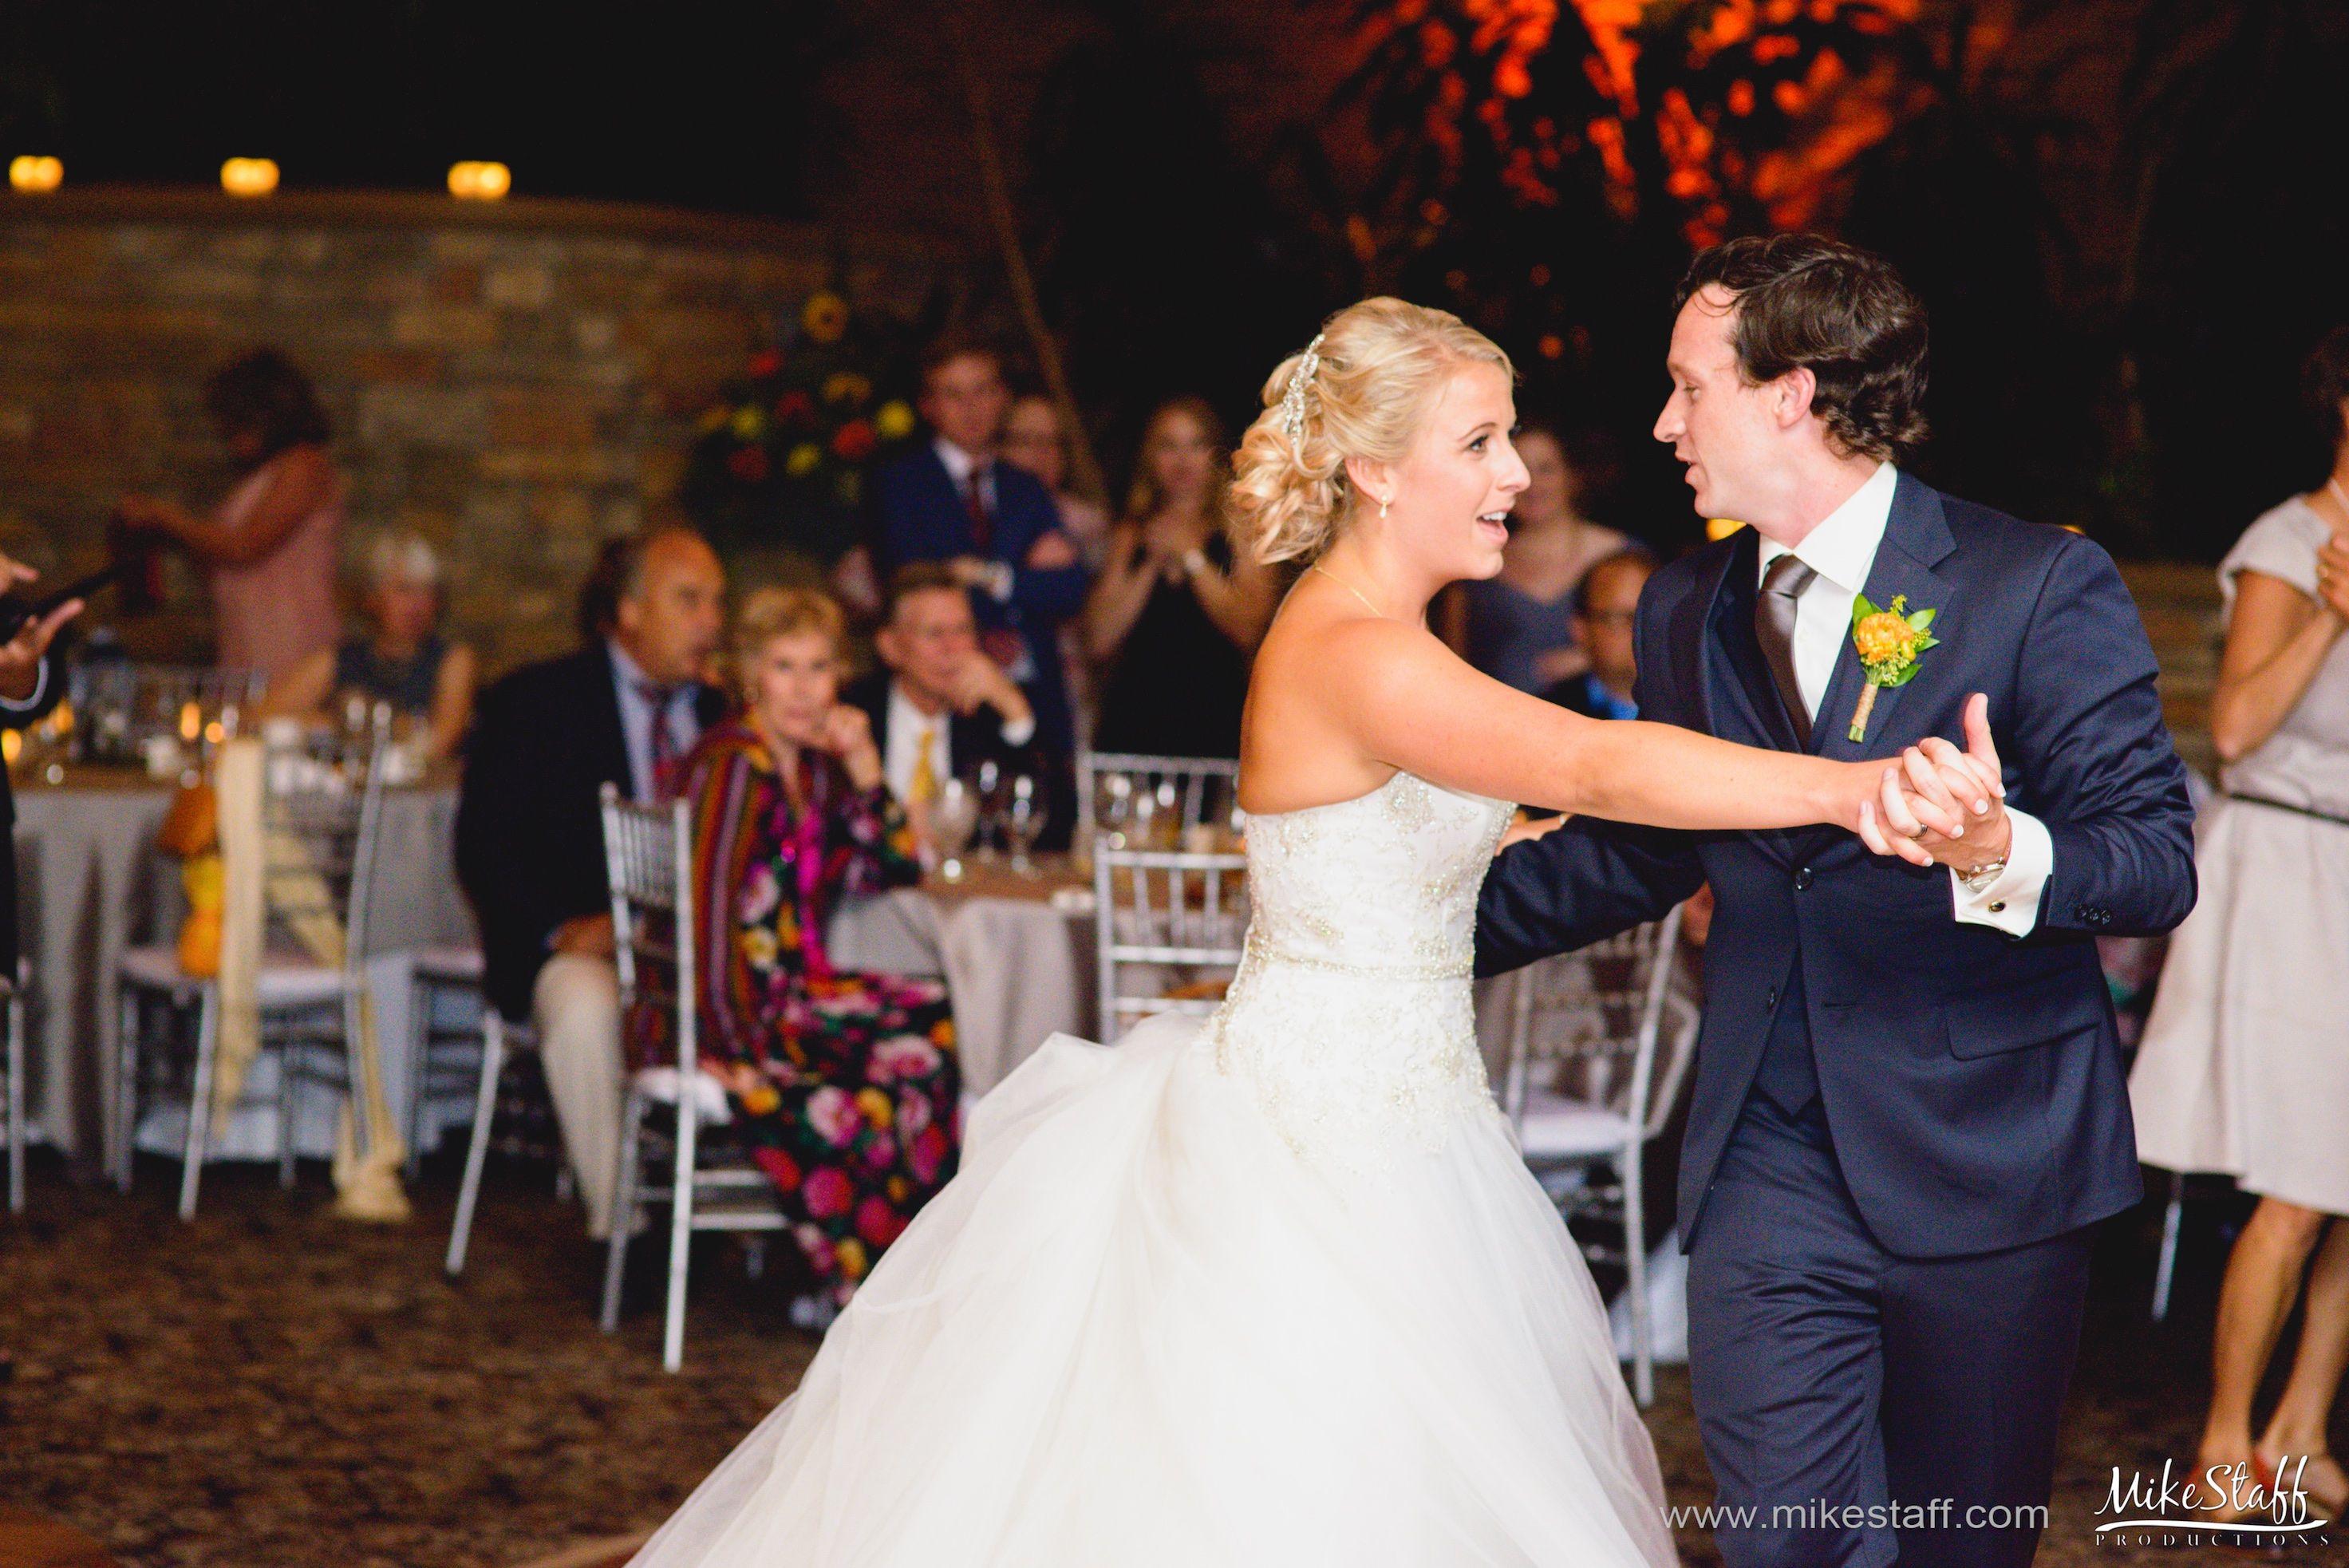 Groom Leads Bride Across The Dance Floor Michiganwedding Chicagowedding Mikestaffproductions Wedding